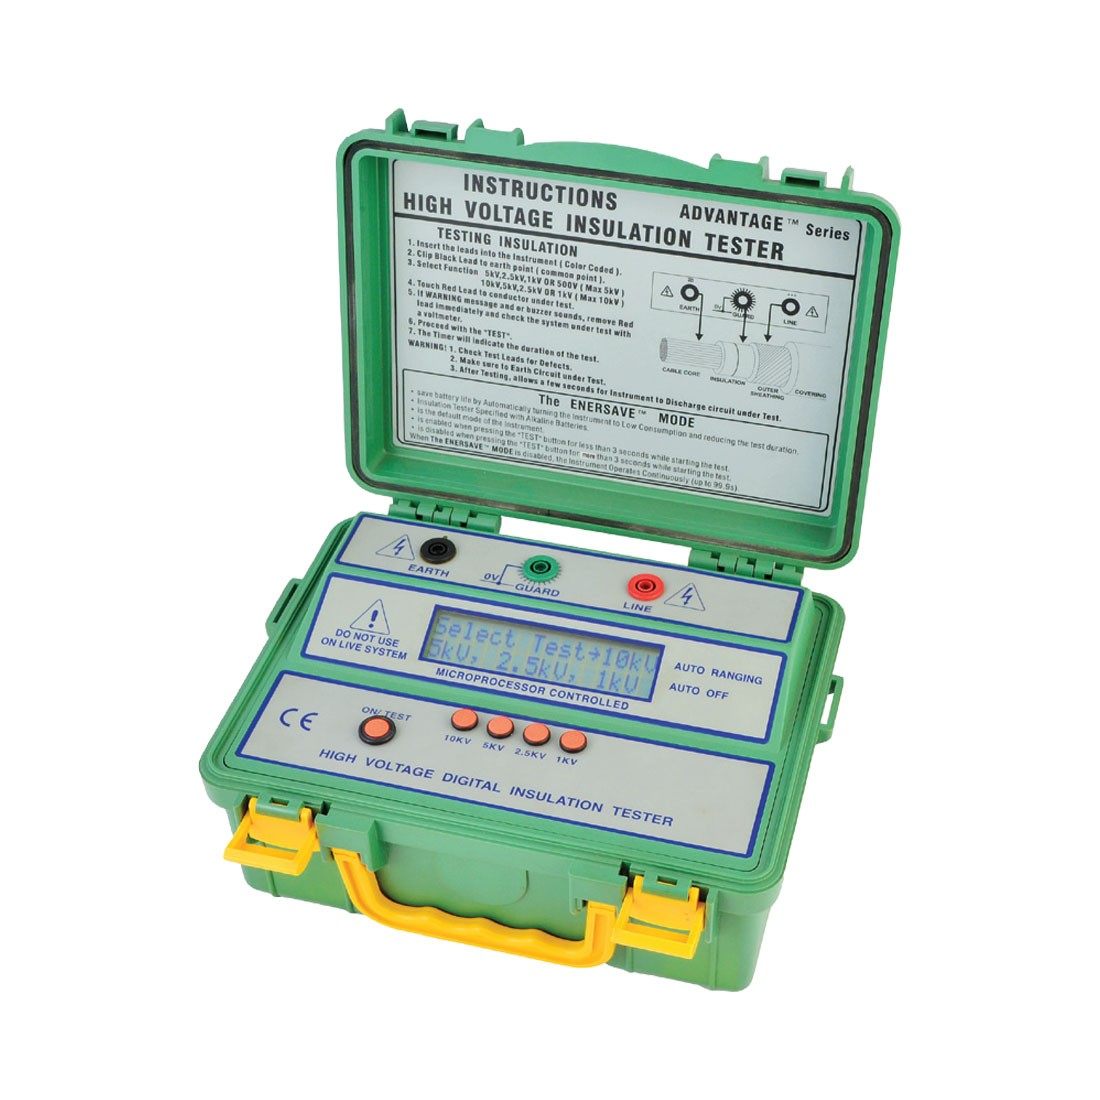 4104IN Digital (Up to 10kV) Insulation Tester